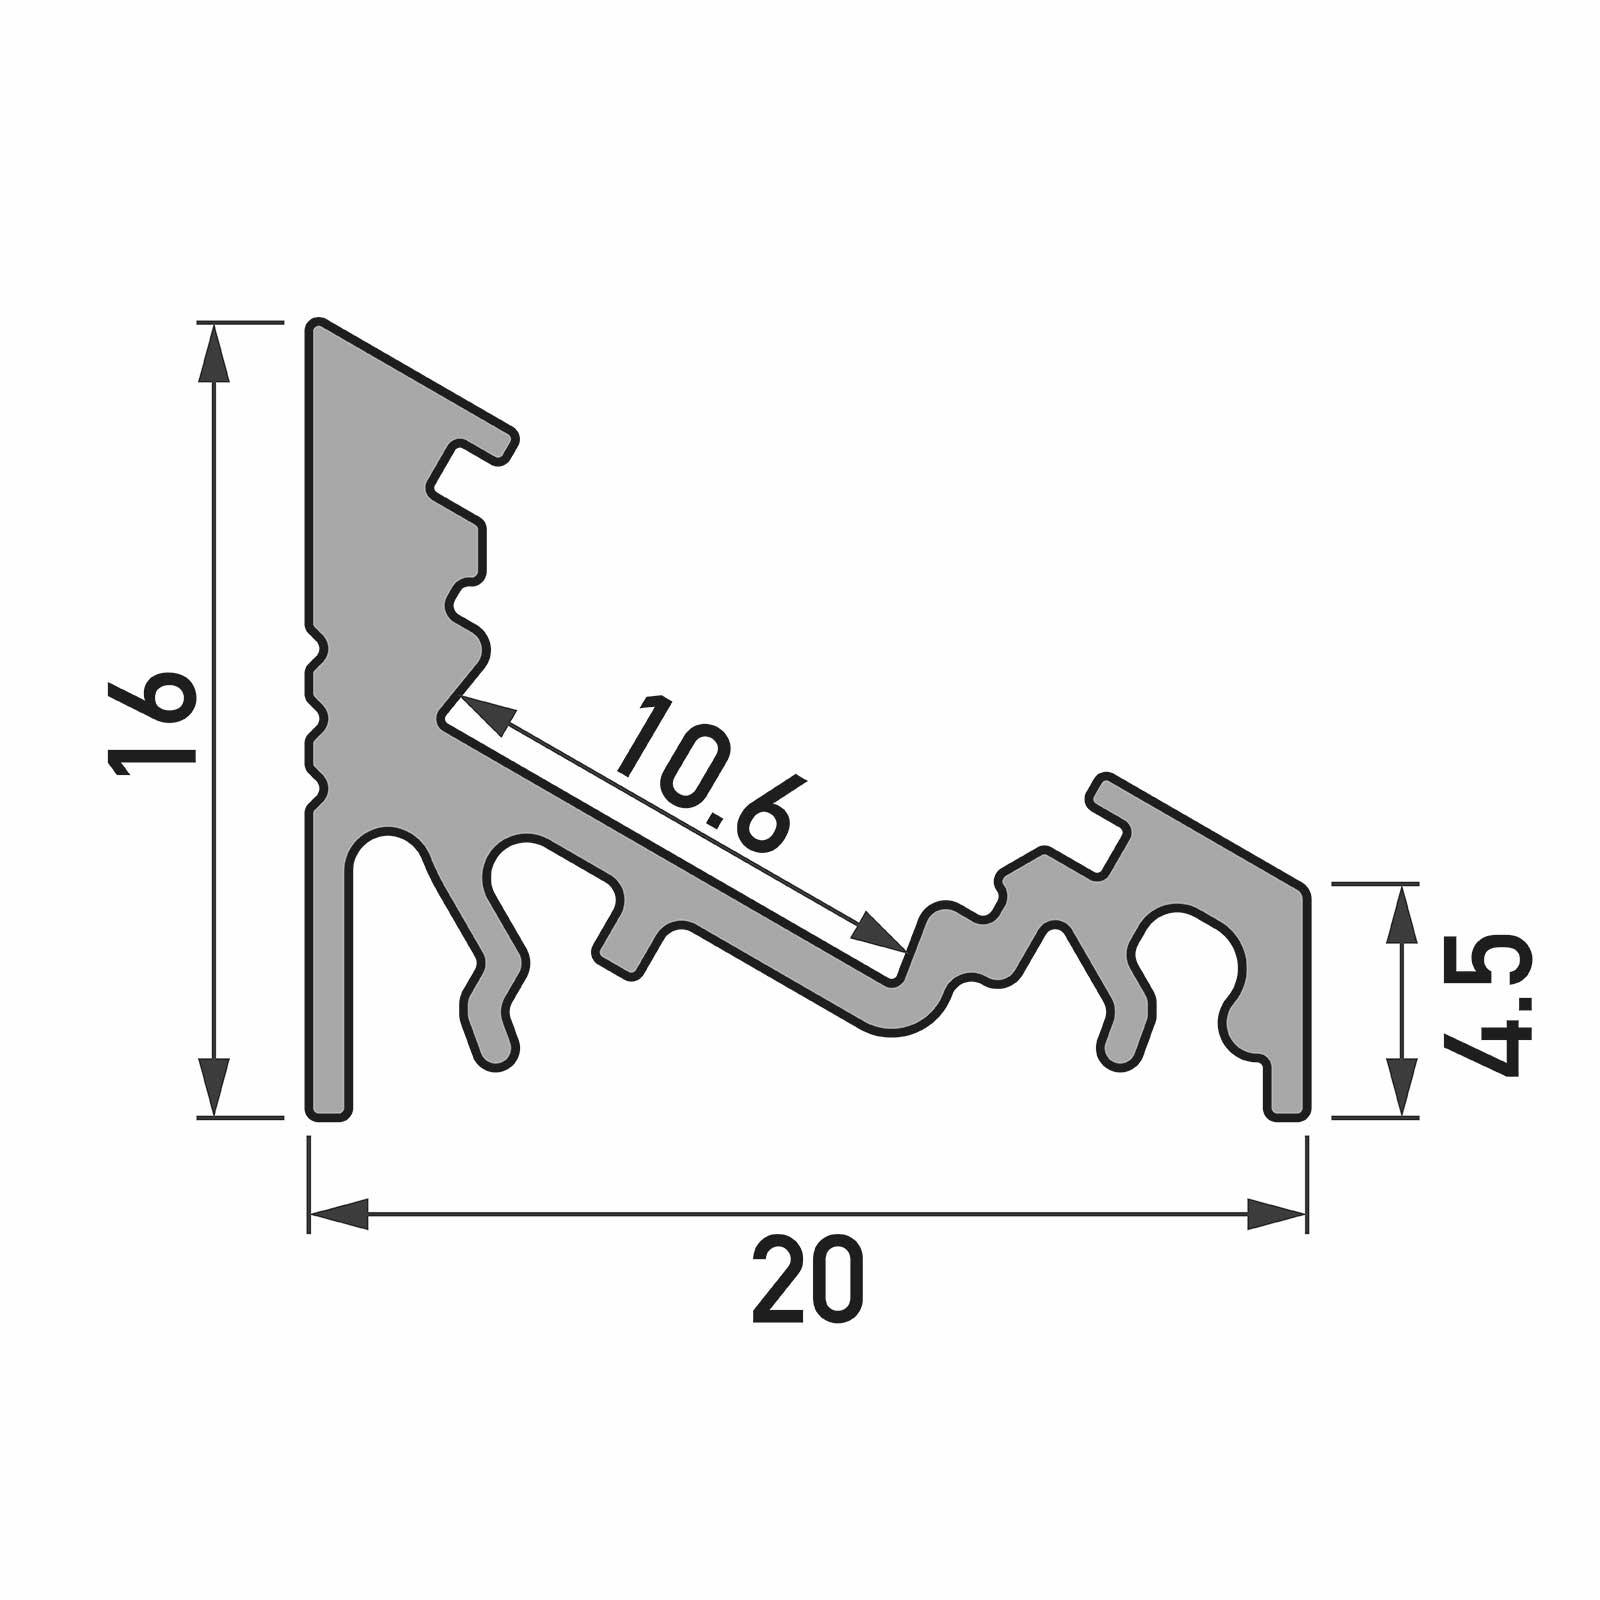 Bemassung 1-2 Meter LED Aufbau-Eckprofil CORNER (CO)